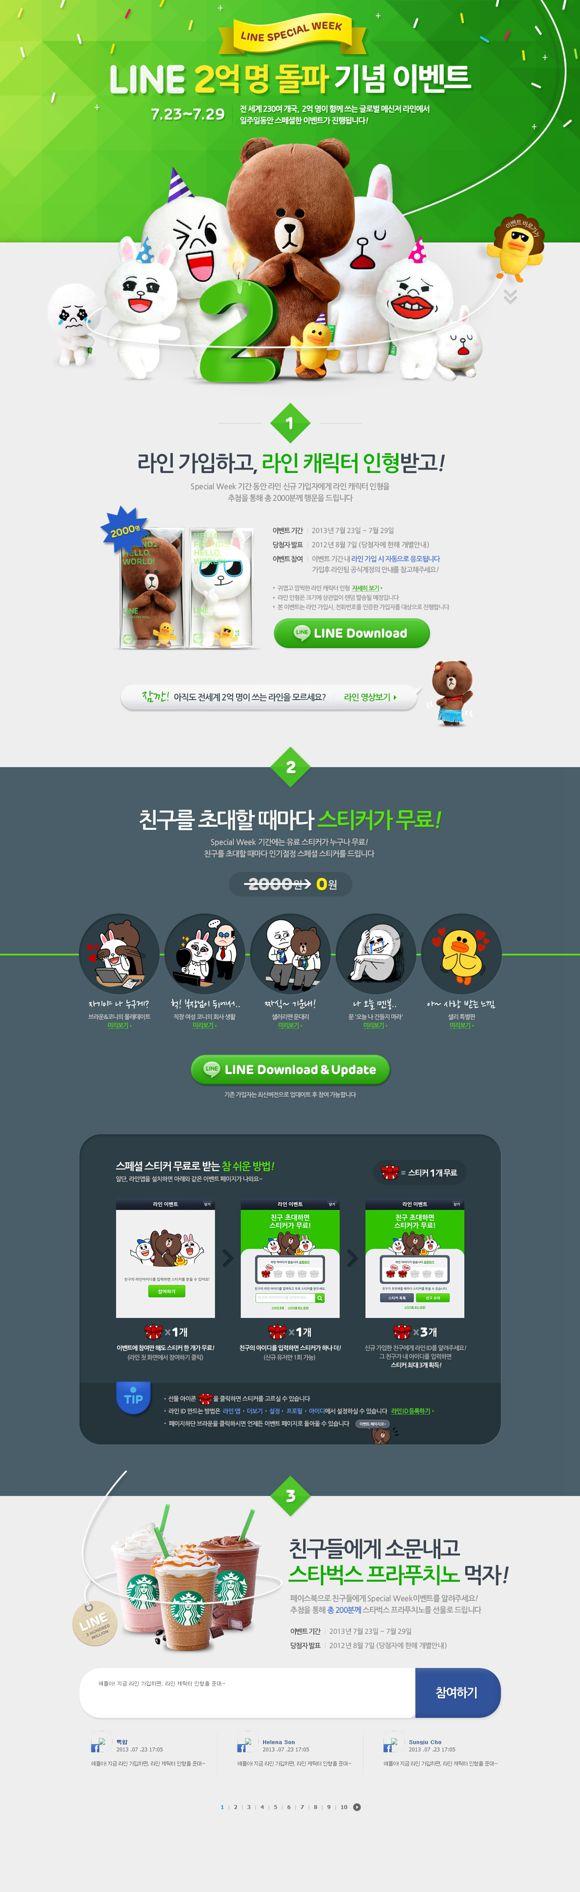 Unique Web Design, Line @omerkabil #WebDesign #Design (http://www.pinterest.com/aldenchong/)